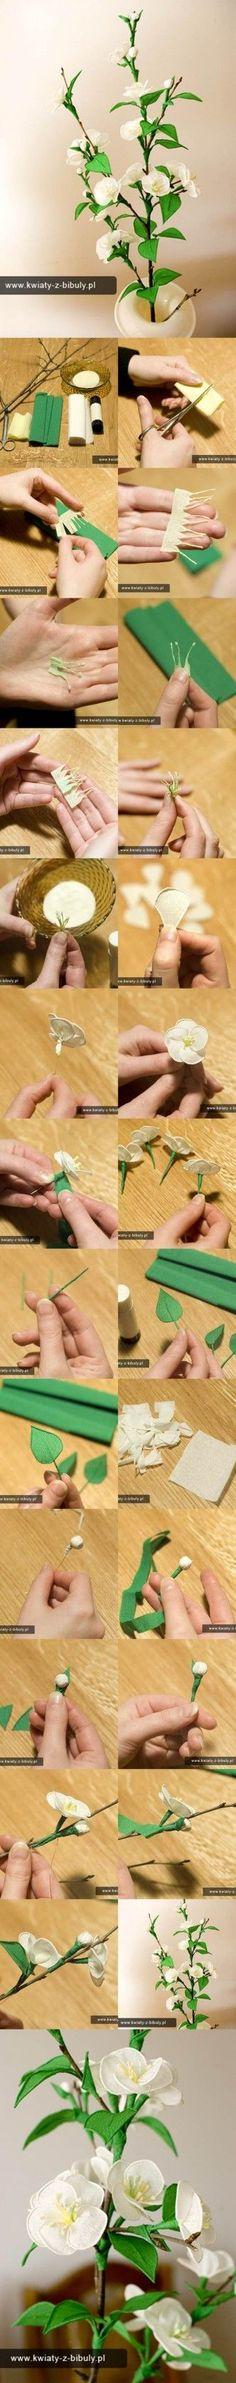 DIY Delicate Crepe Paper Cherry Blossom Sprig